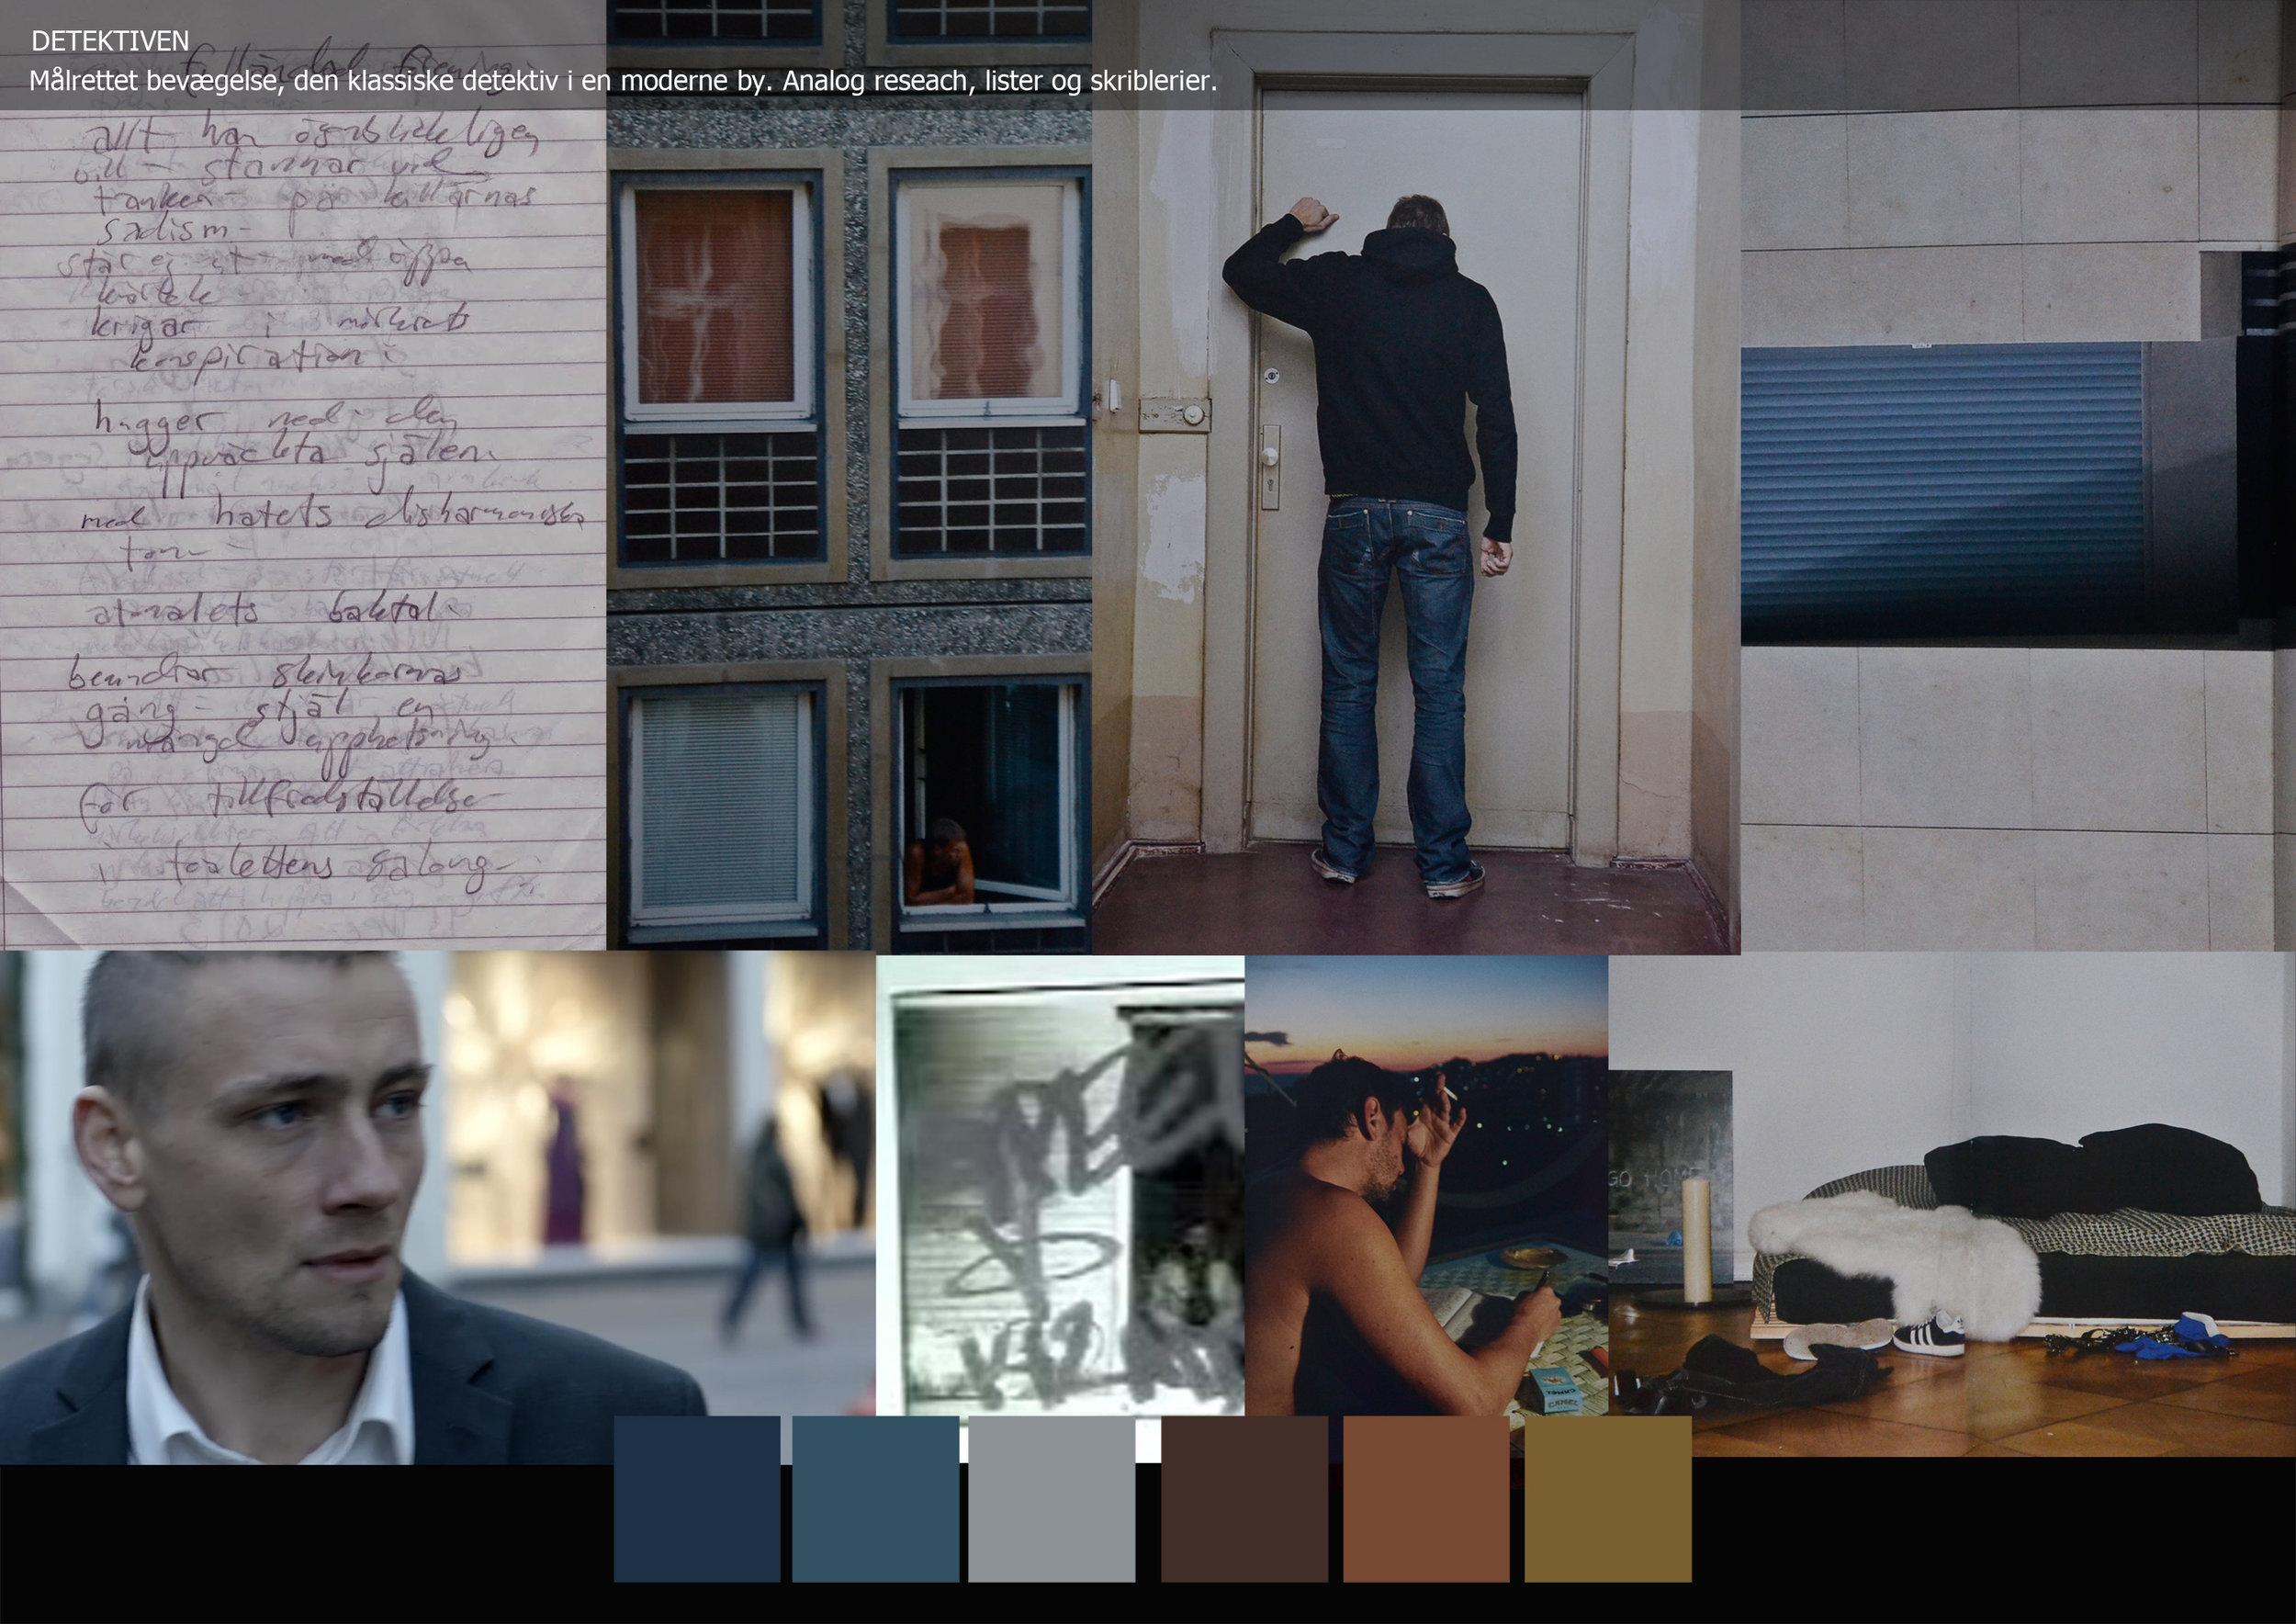 production_design_knirke_madelung_aminas_breve_3.jpg